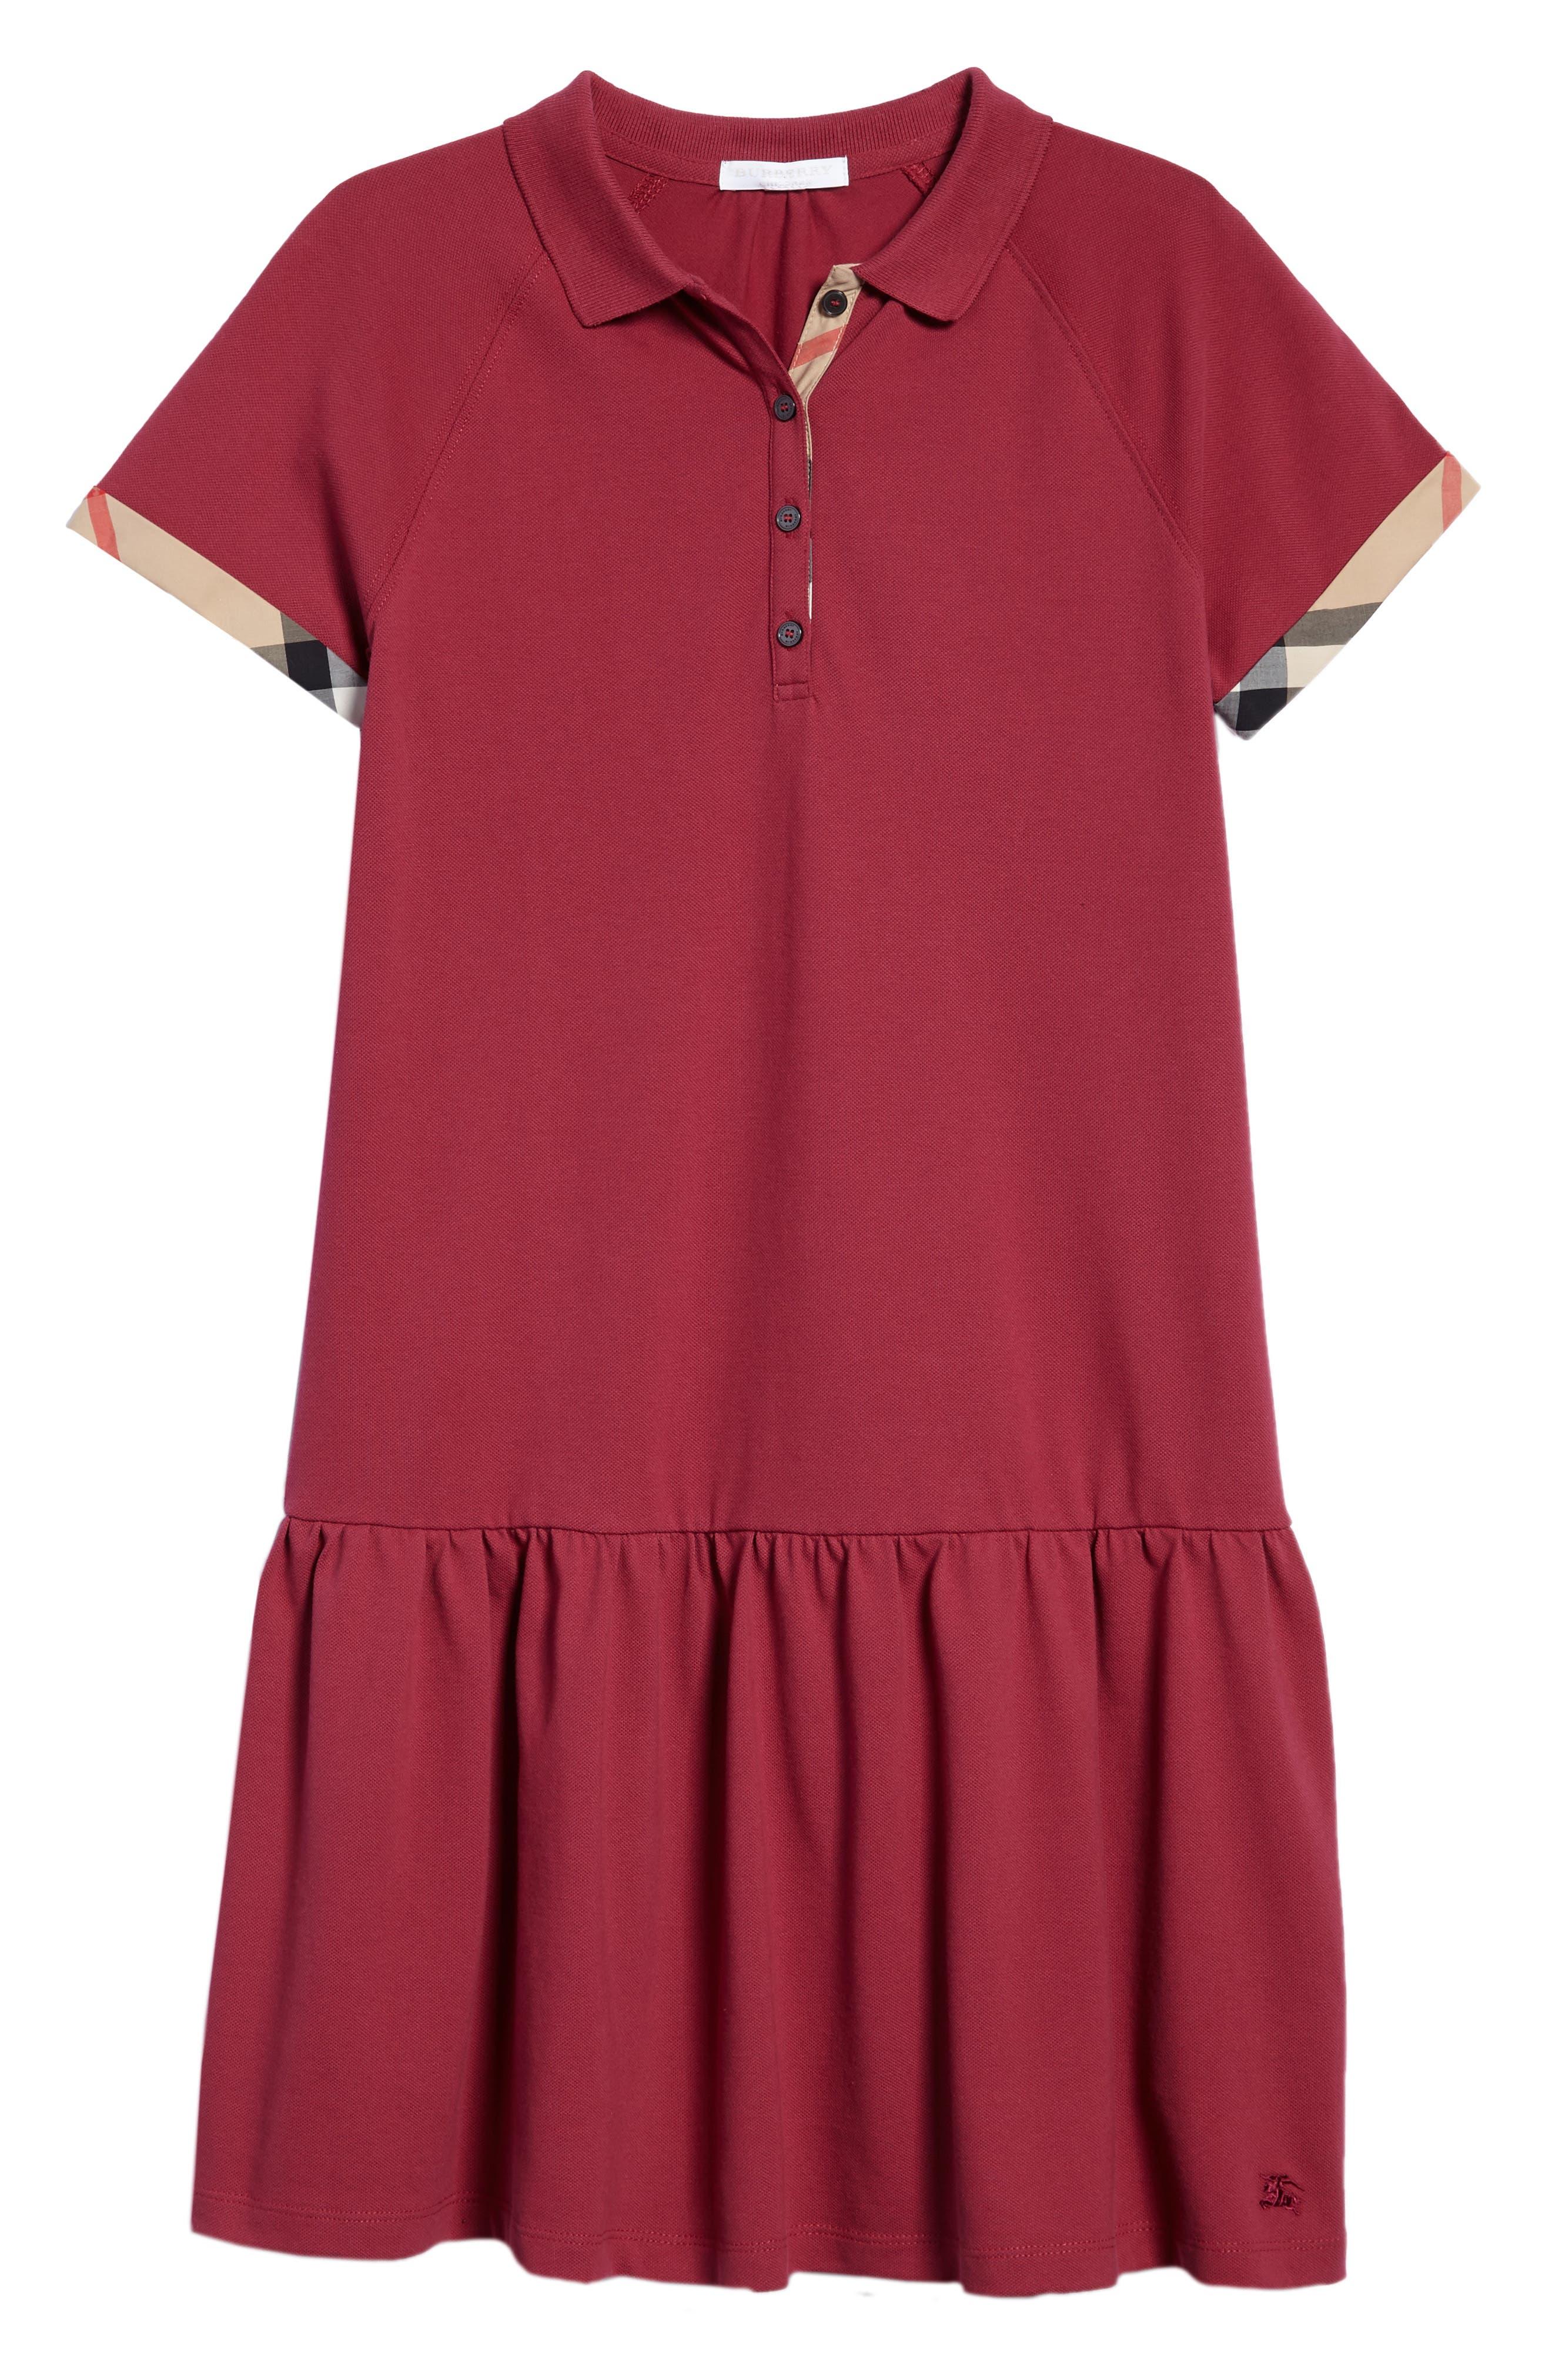 Burberry Cali Polo Dress (Little Girls & Big Girls)